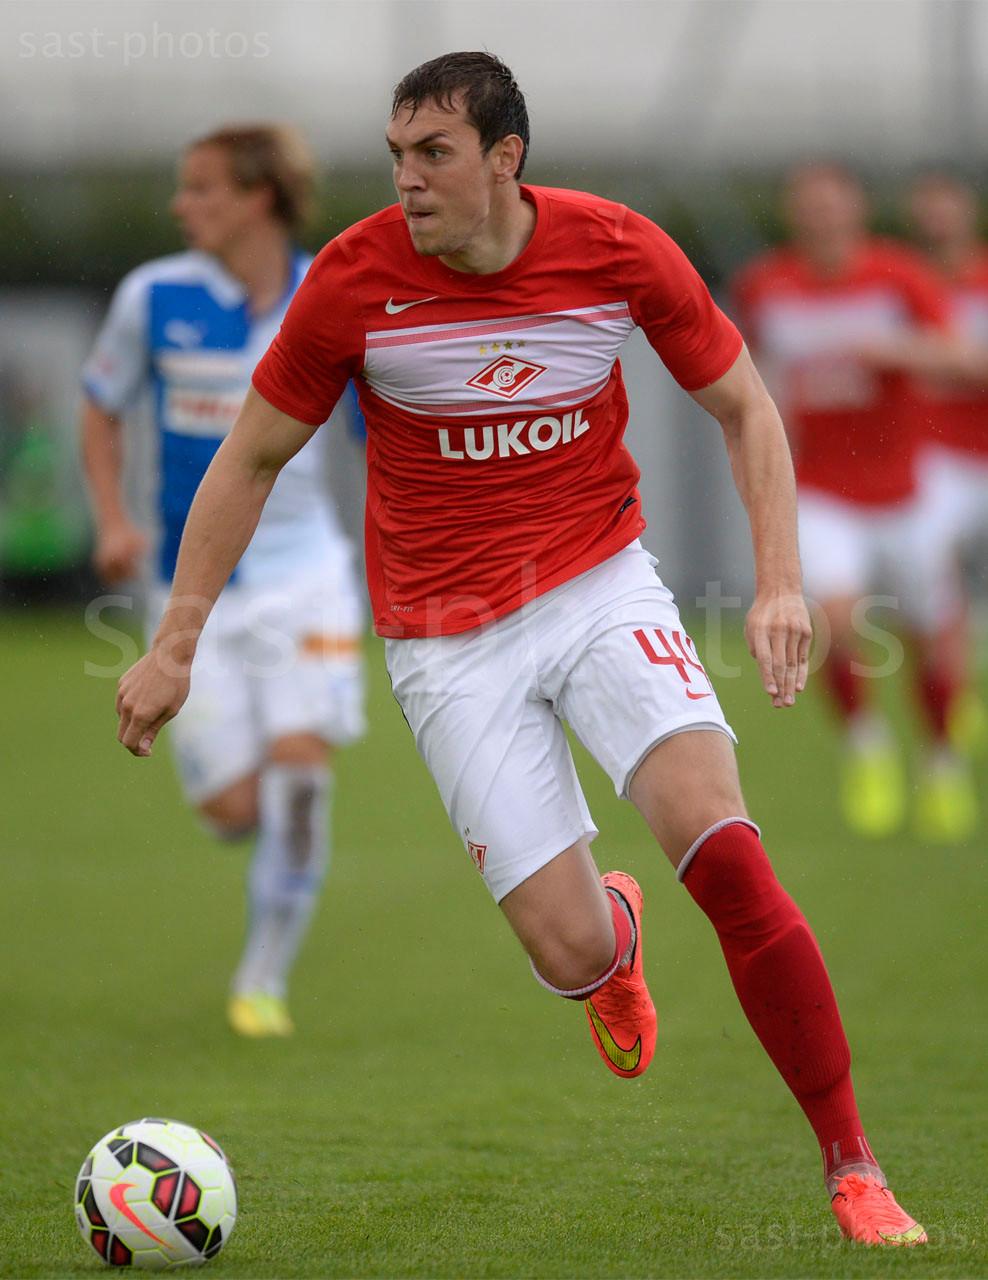 Artem Dzyuba (Spartak)